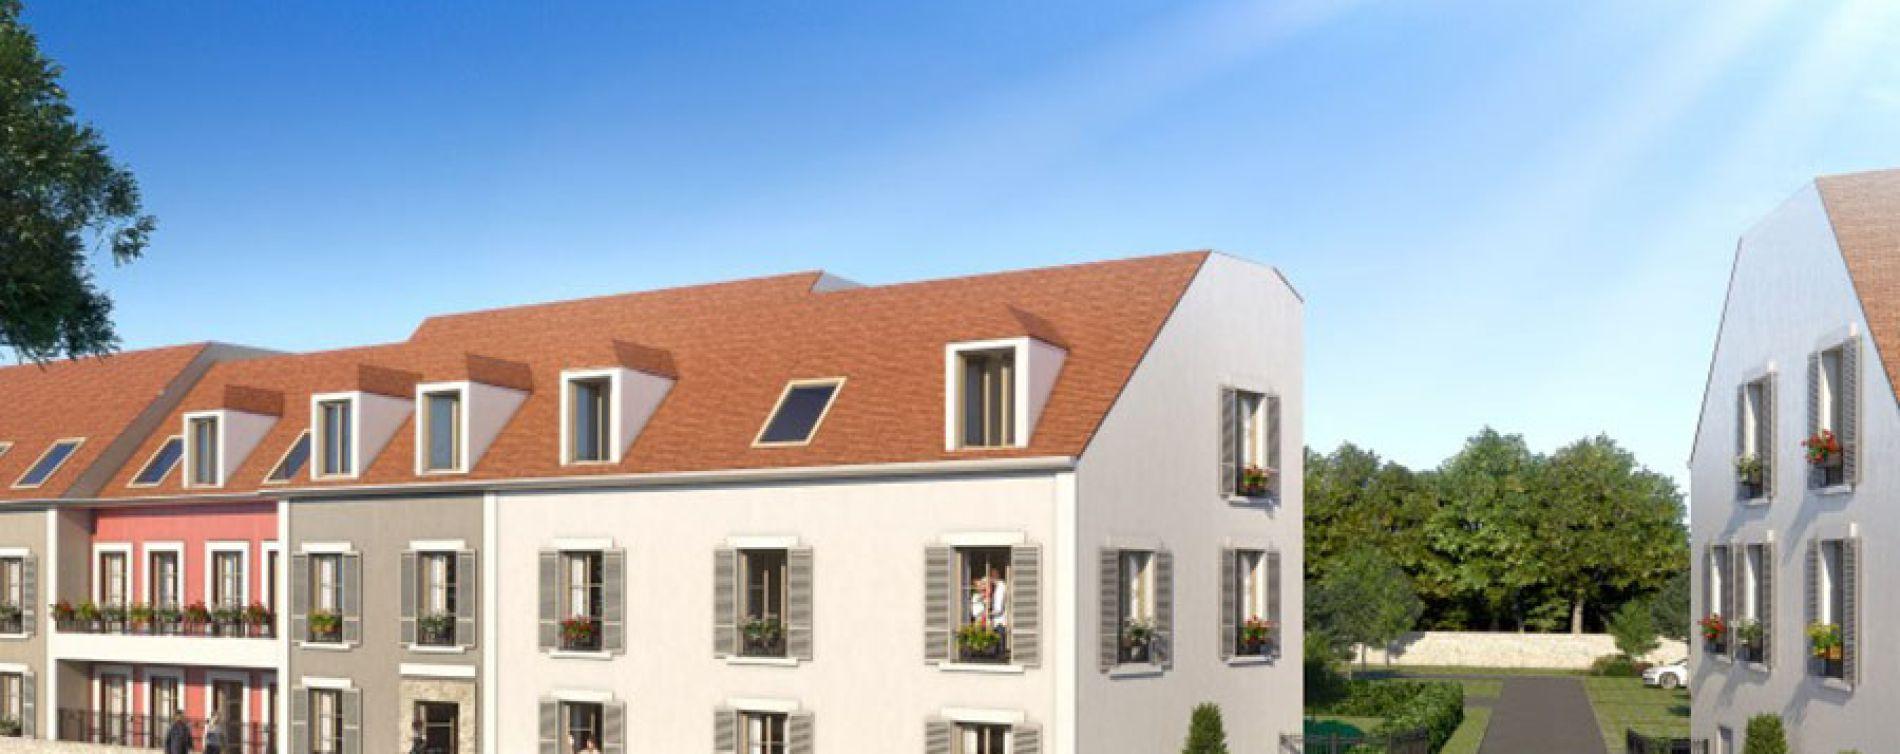 Résidence La Ferme Côté Jardin à Moissy-Cramayel